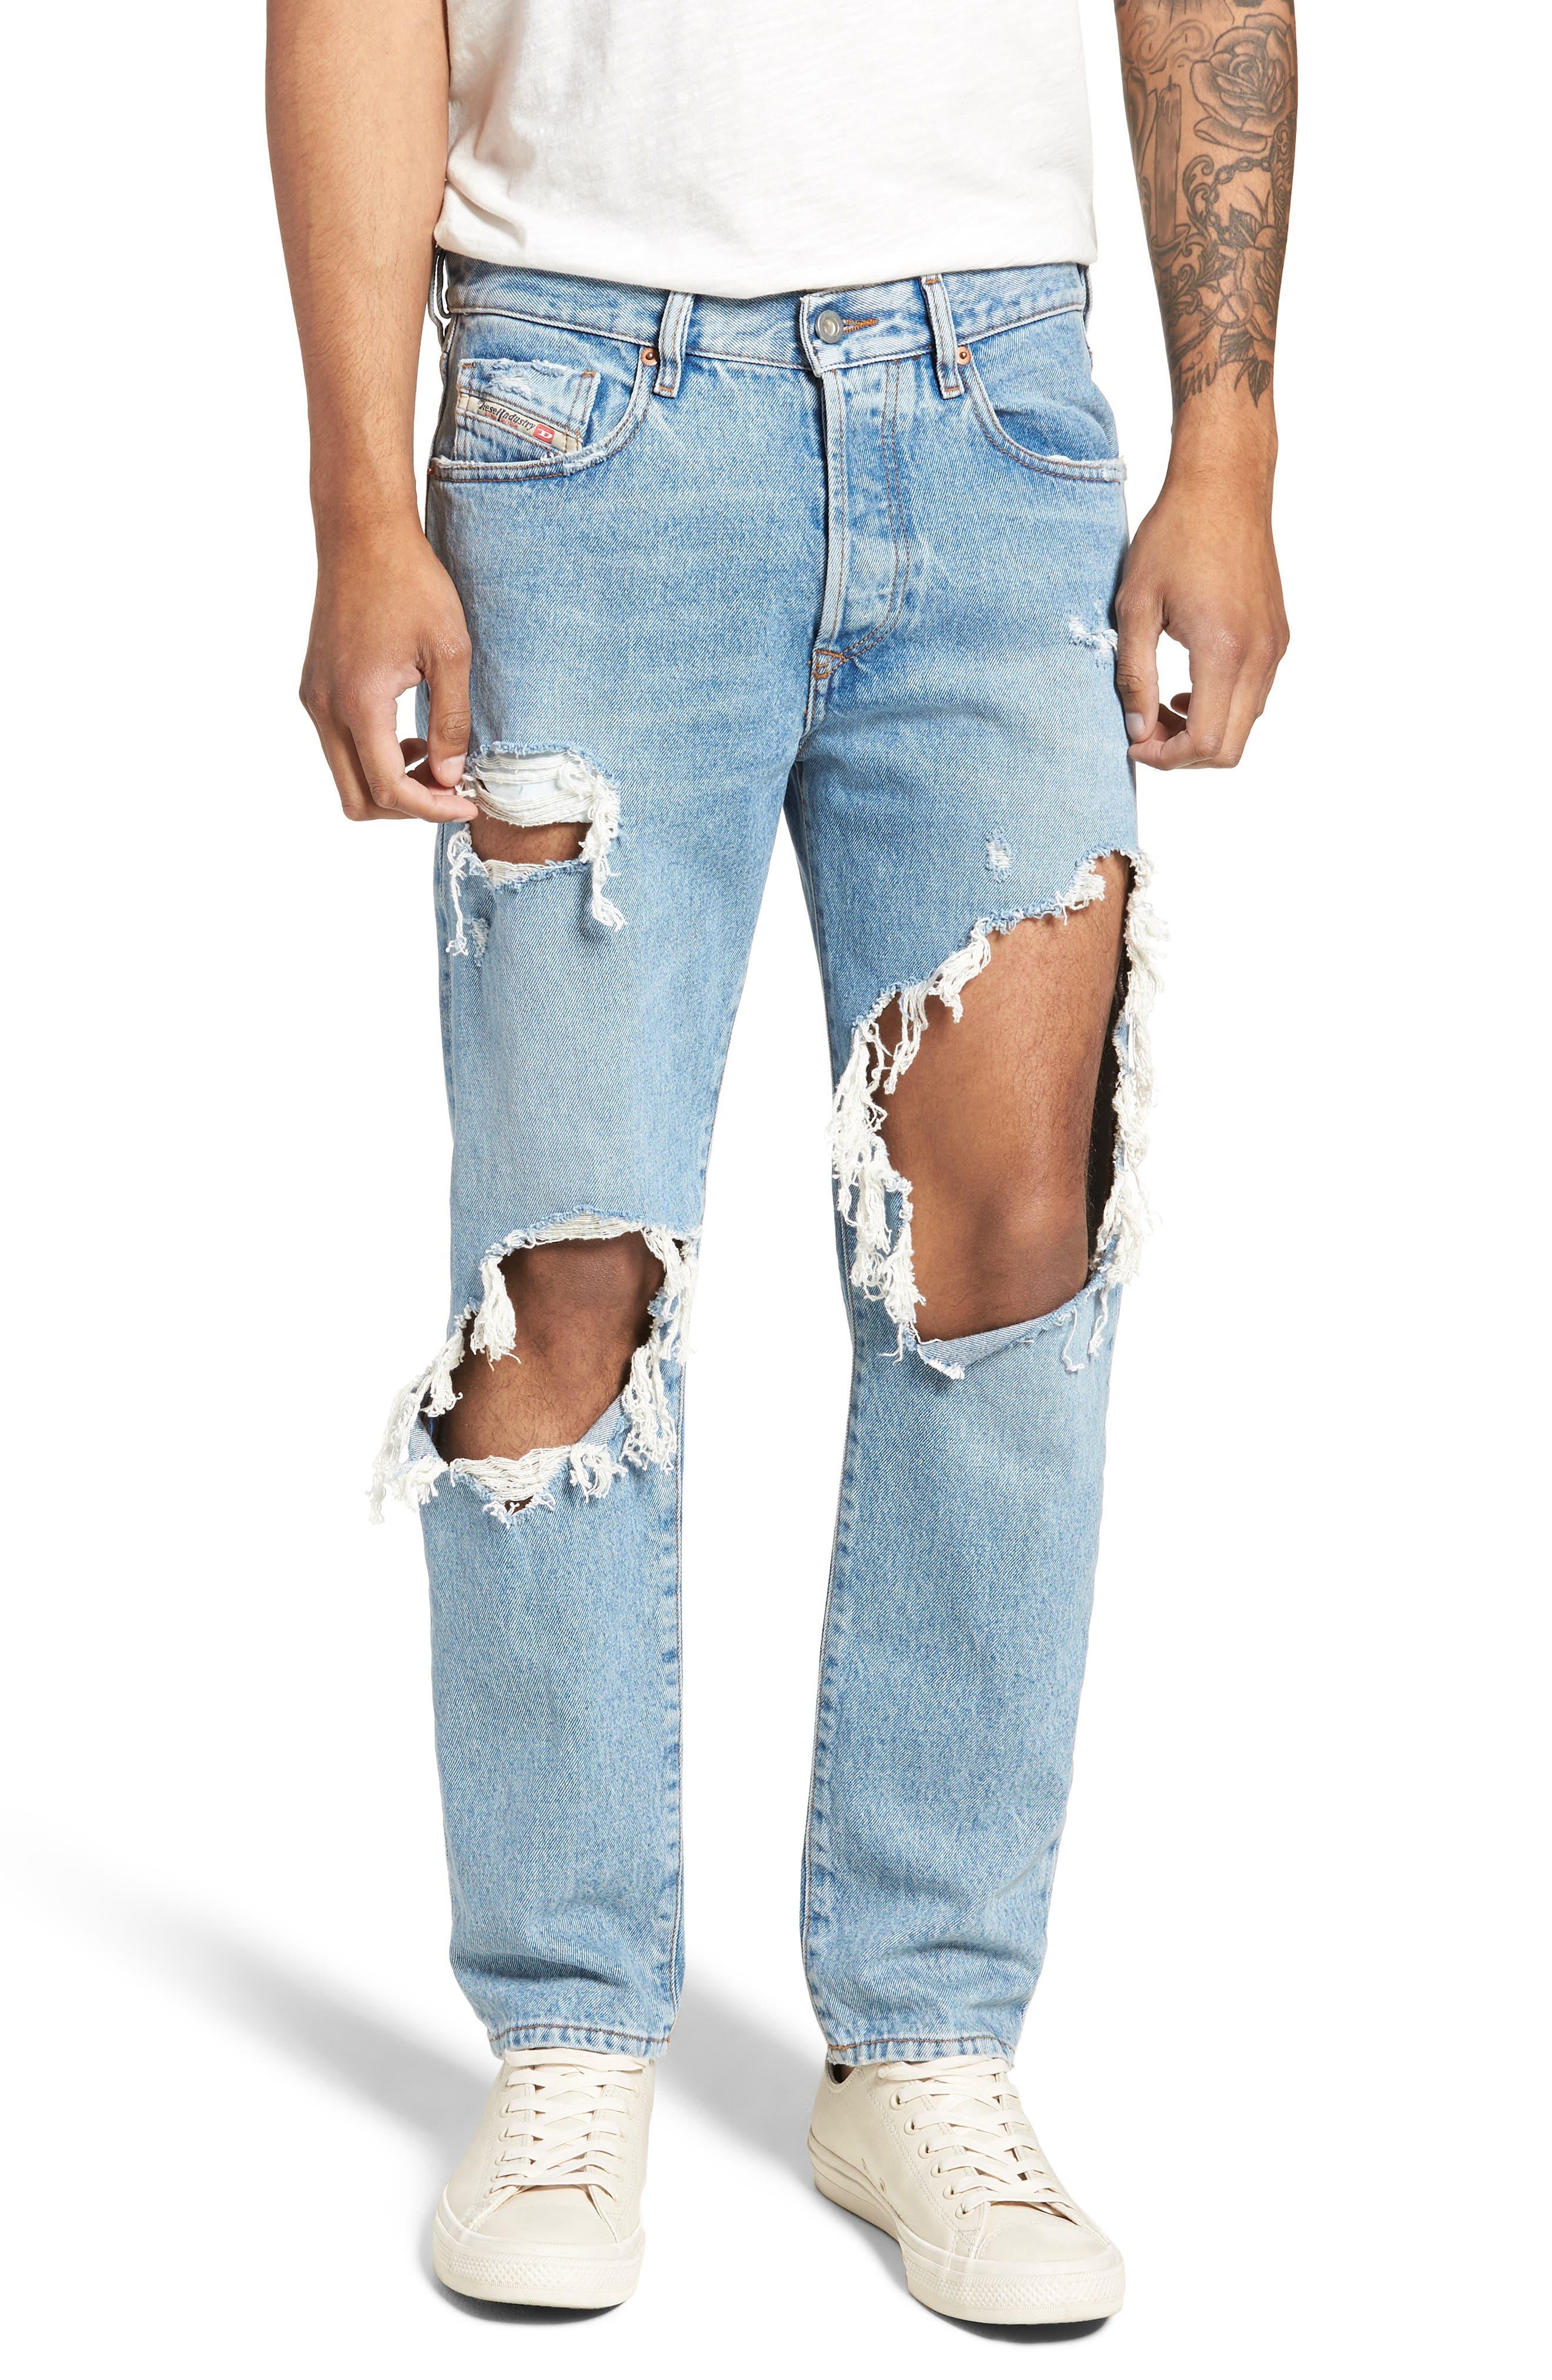 Mharky Slim Straight Leg Jeans,                             Main thumbnail 1, color,                             0076M